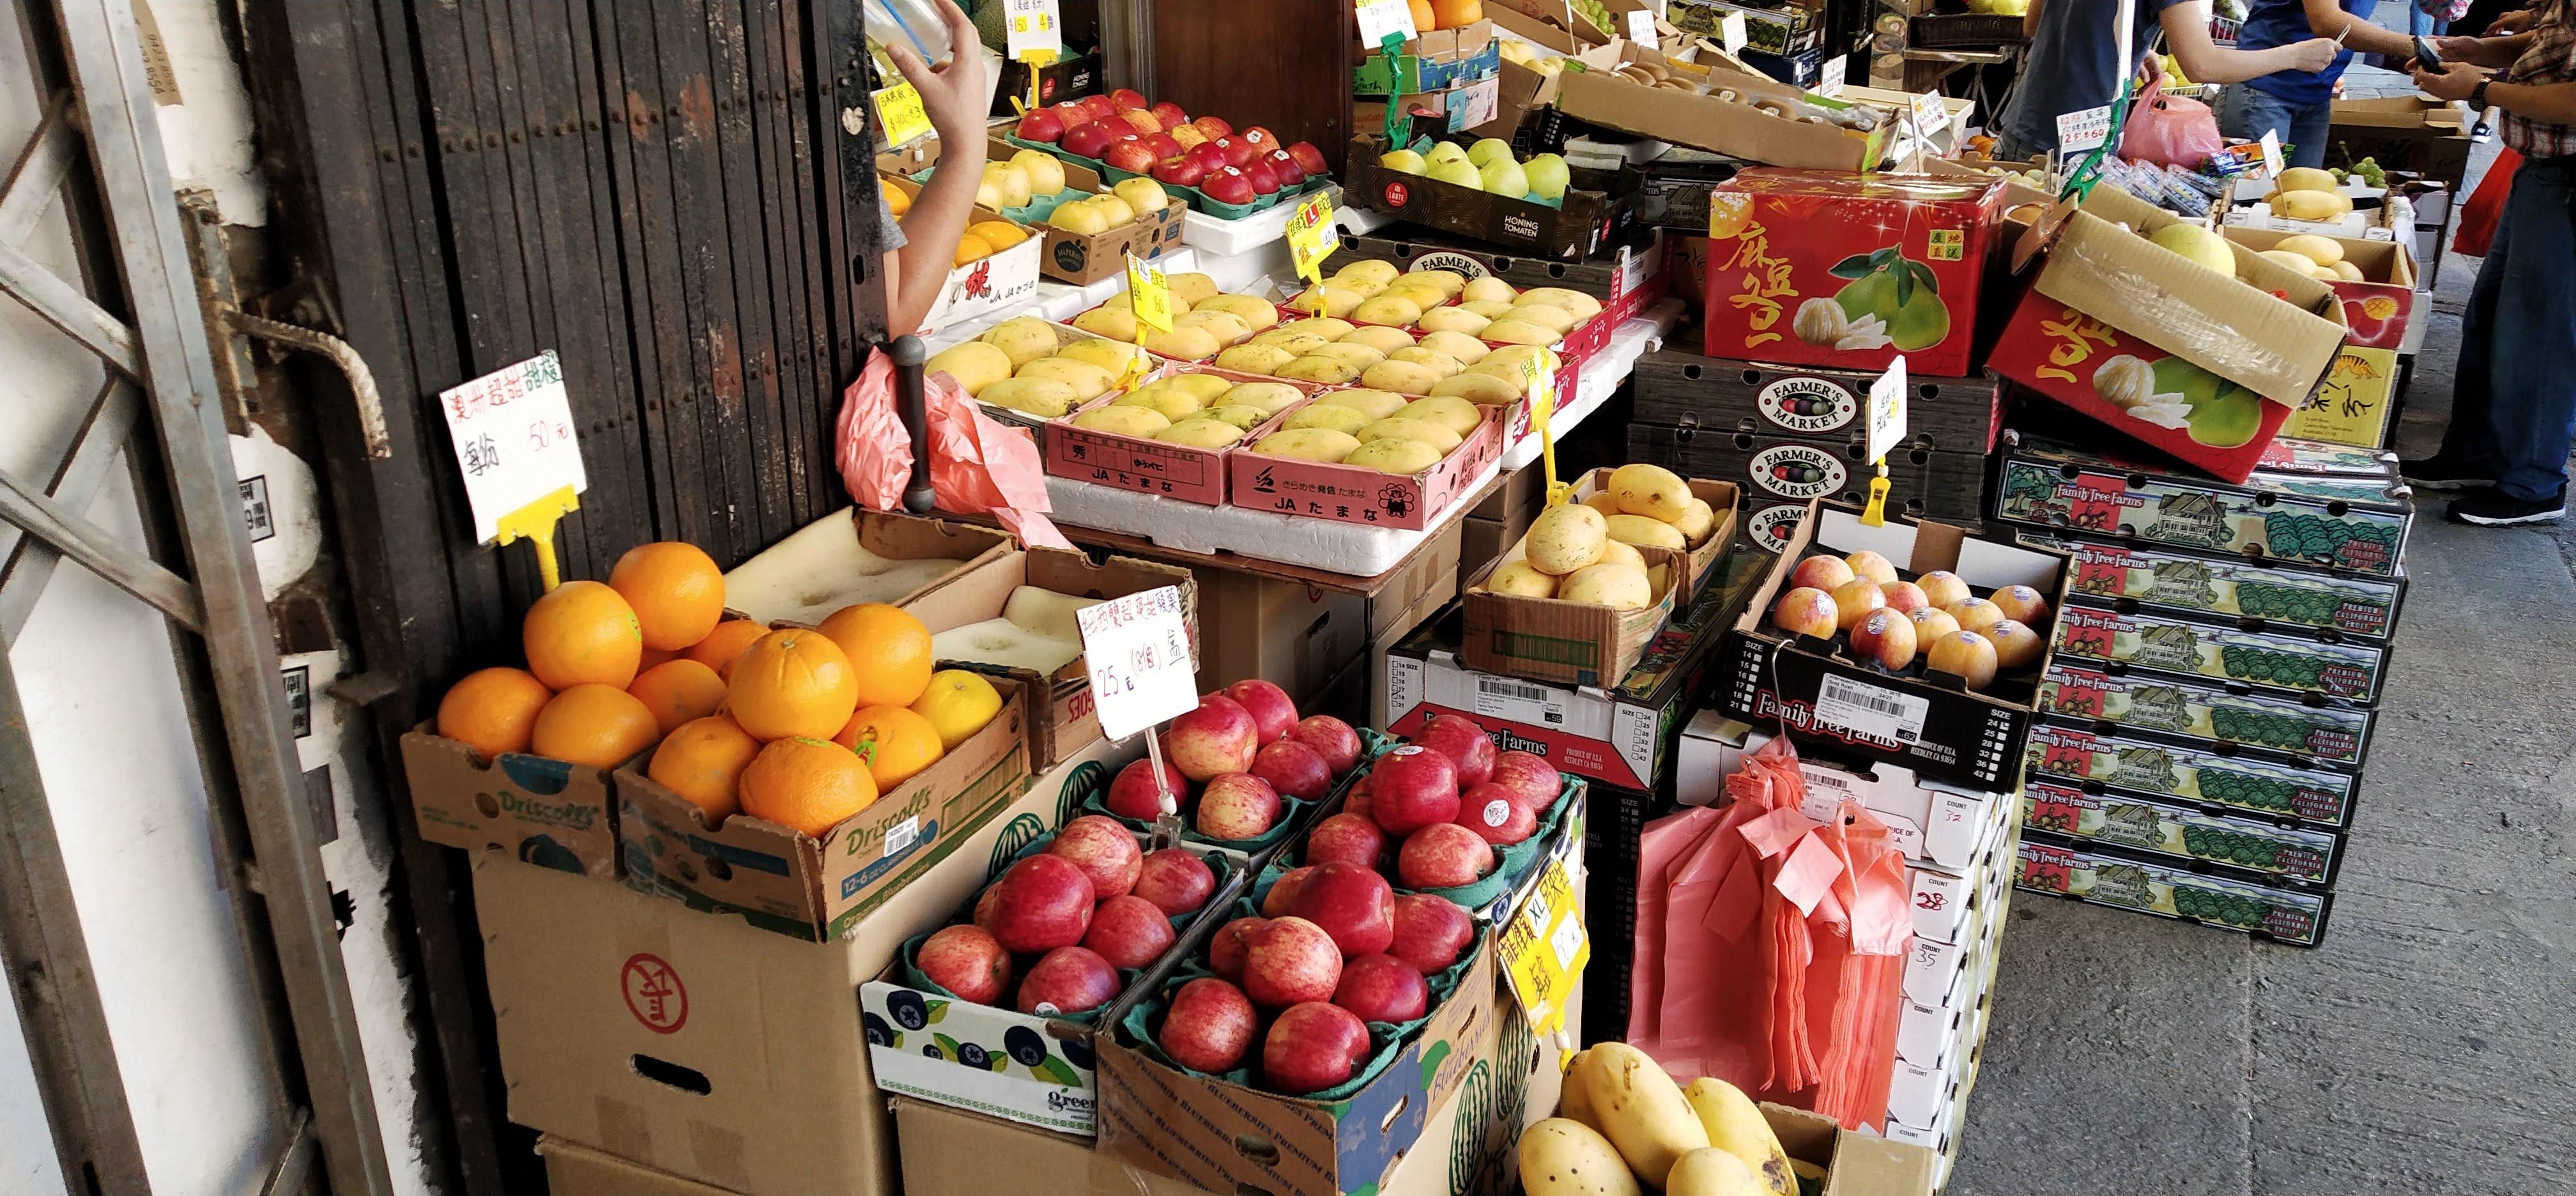 Fruits for retail at Yau Ma Tei Wholesale Fruit Market